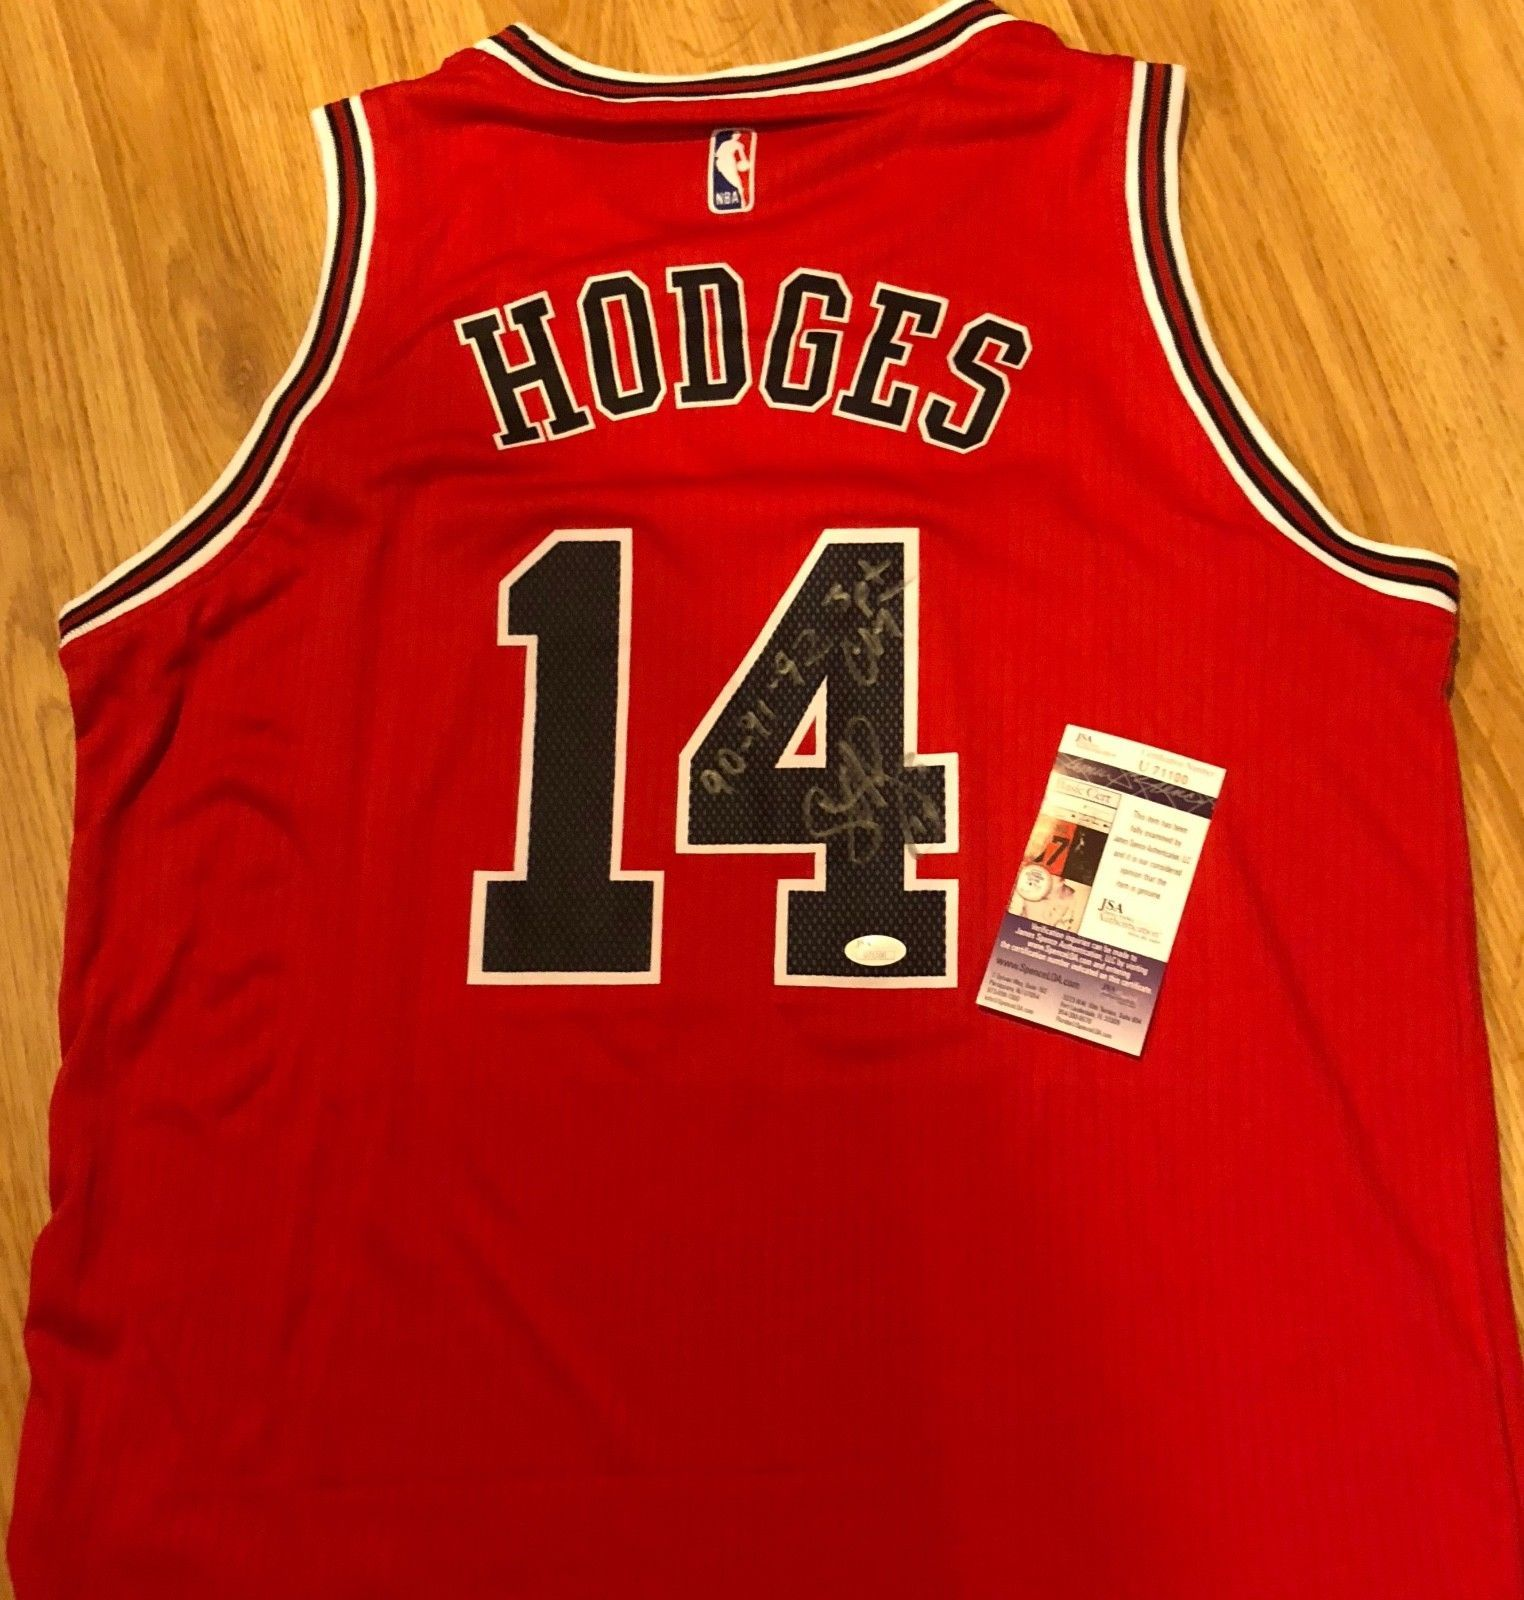 eaa8e1ba63b Craig Hodges Signed Auto Chicago Bulls and 42 similar items. S l1600